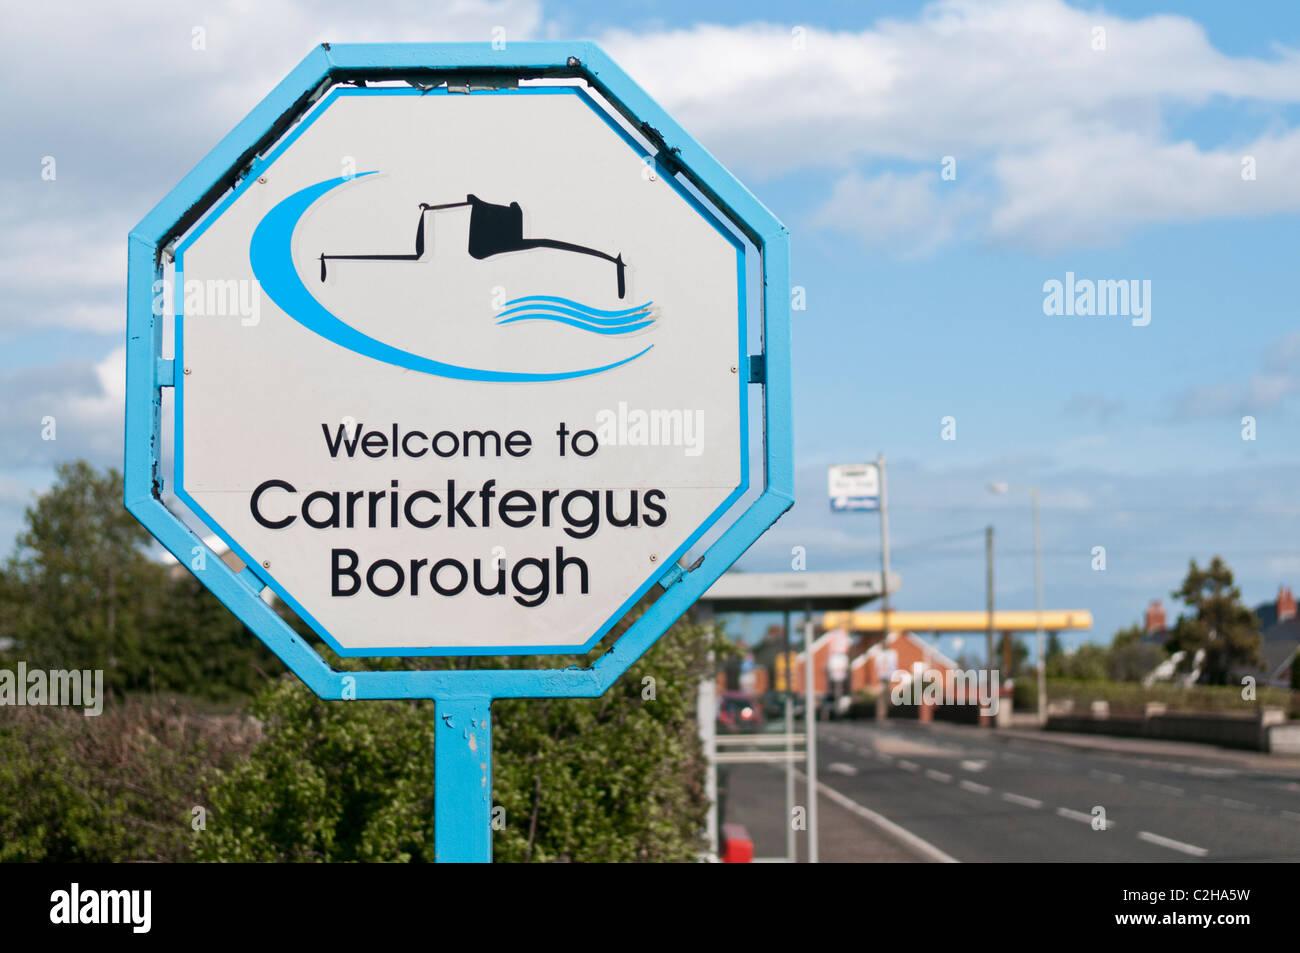 "Sign for Carrickfergus Borough Council. ""Welcome to Carrickfergus Borough"" Stock Photo"